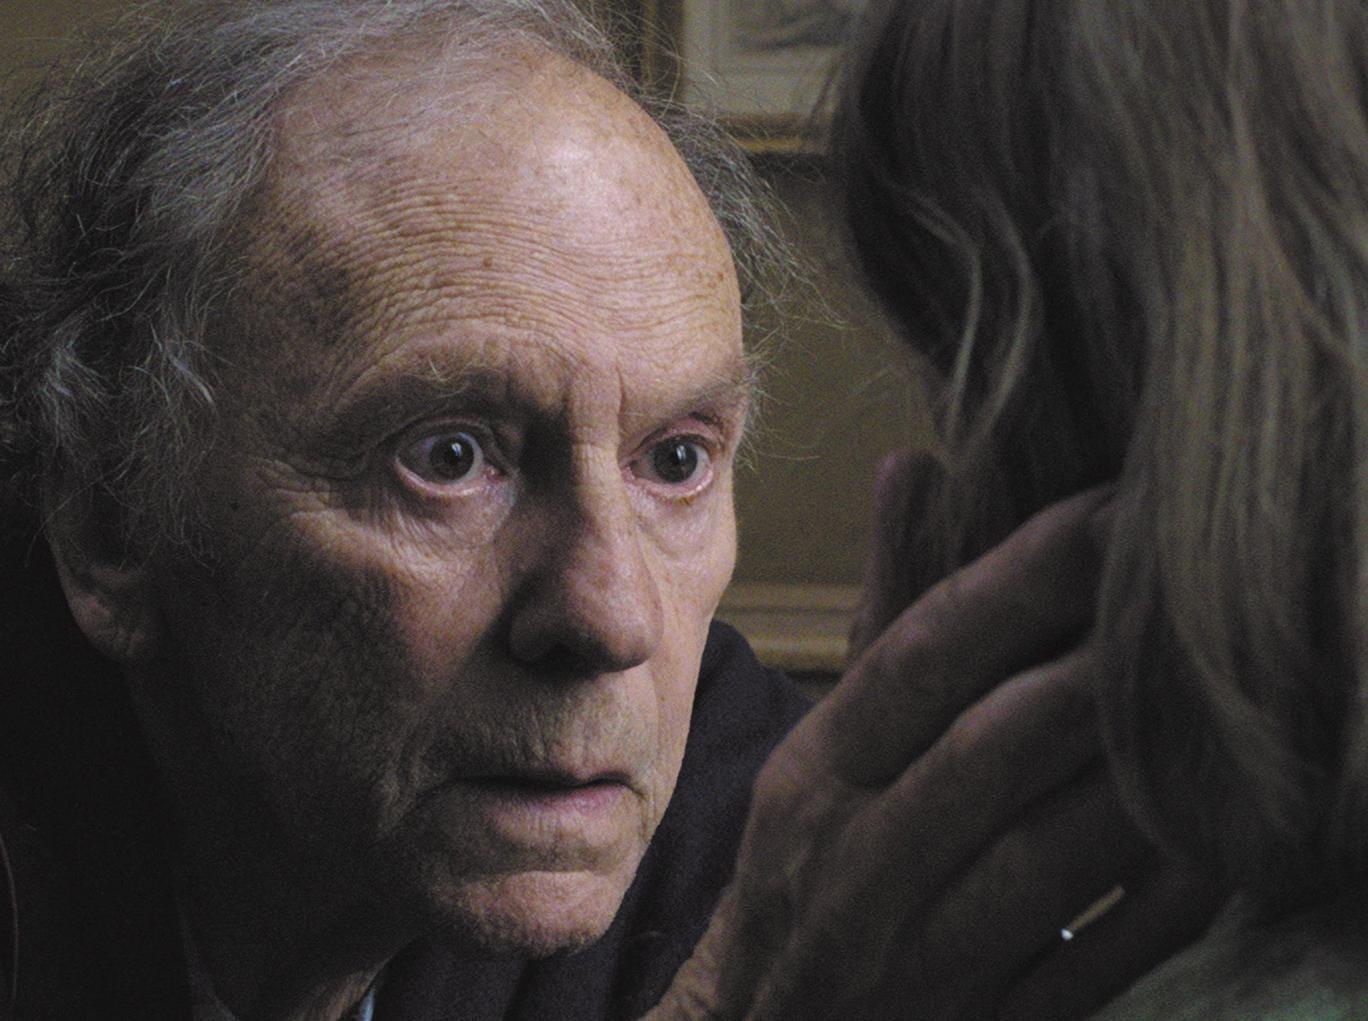 Amour, Michael Haneke's new film